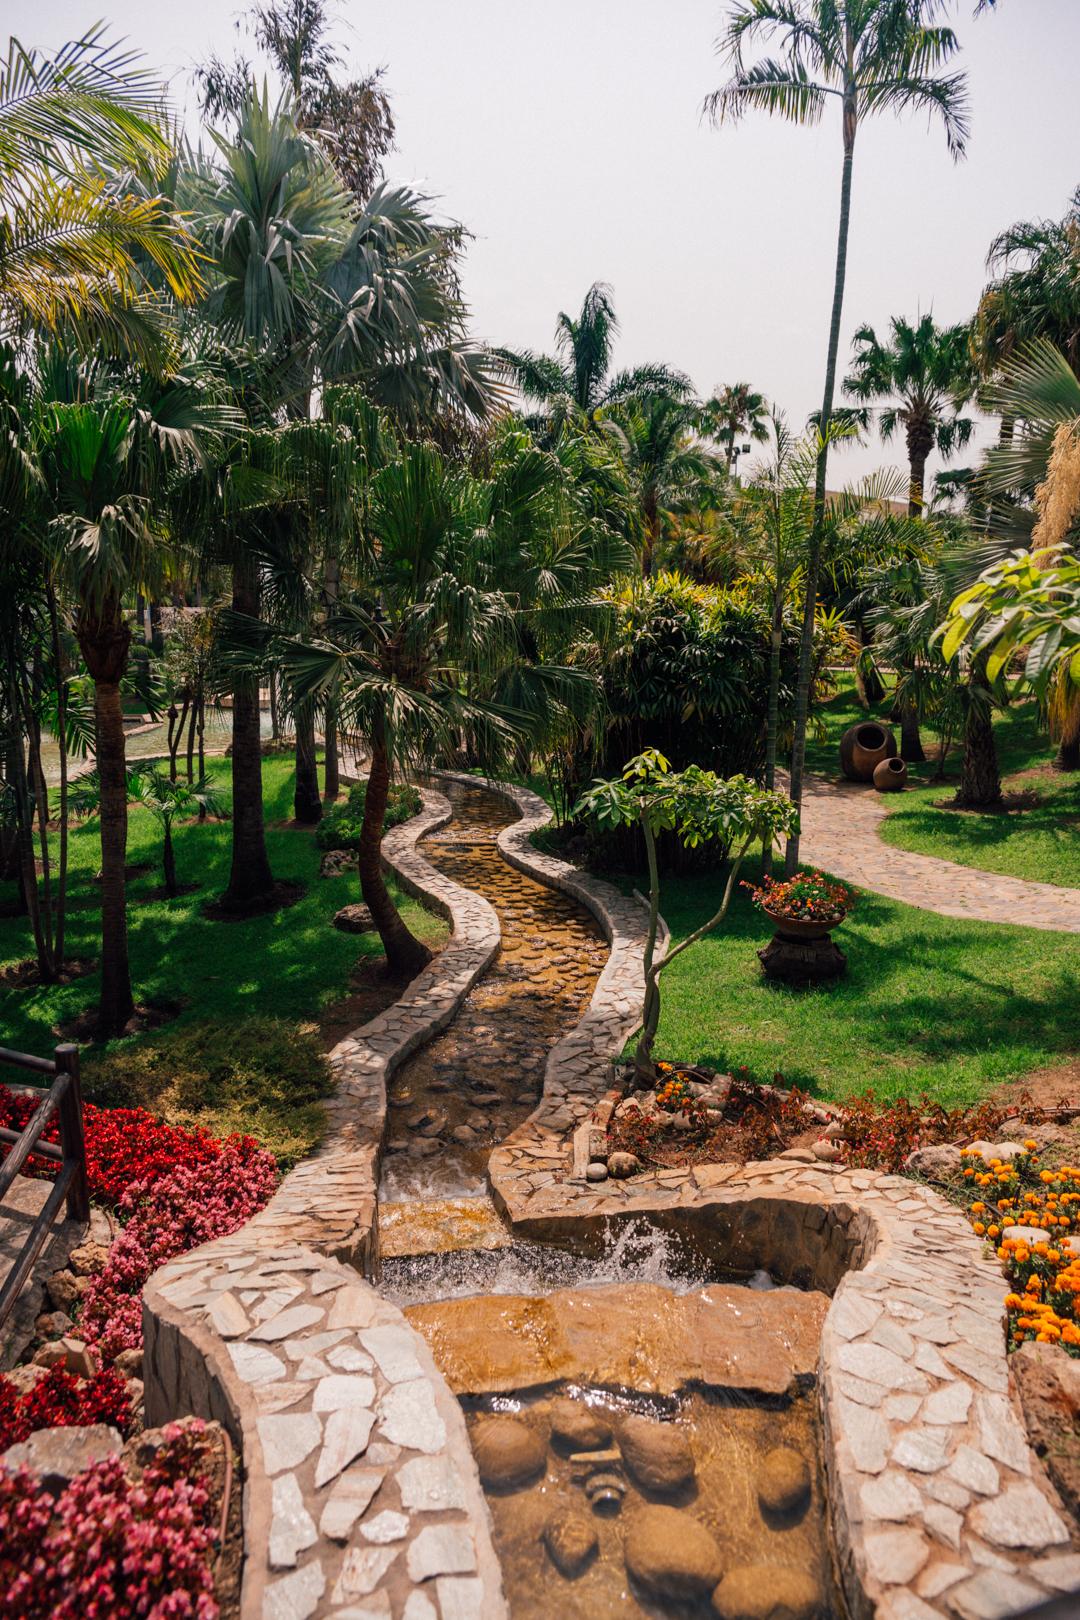 Molino de Inca Botanical Garden in Torremolinos